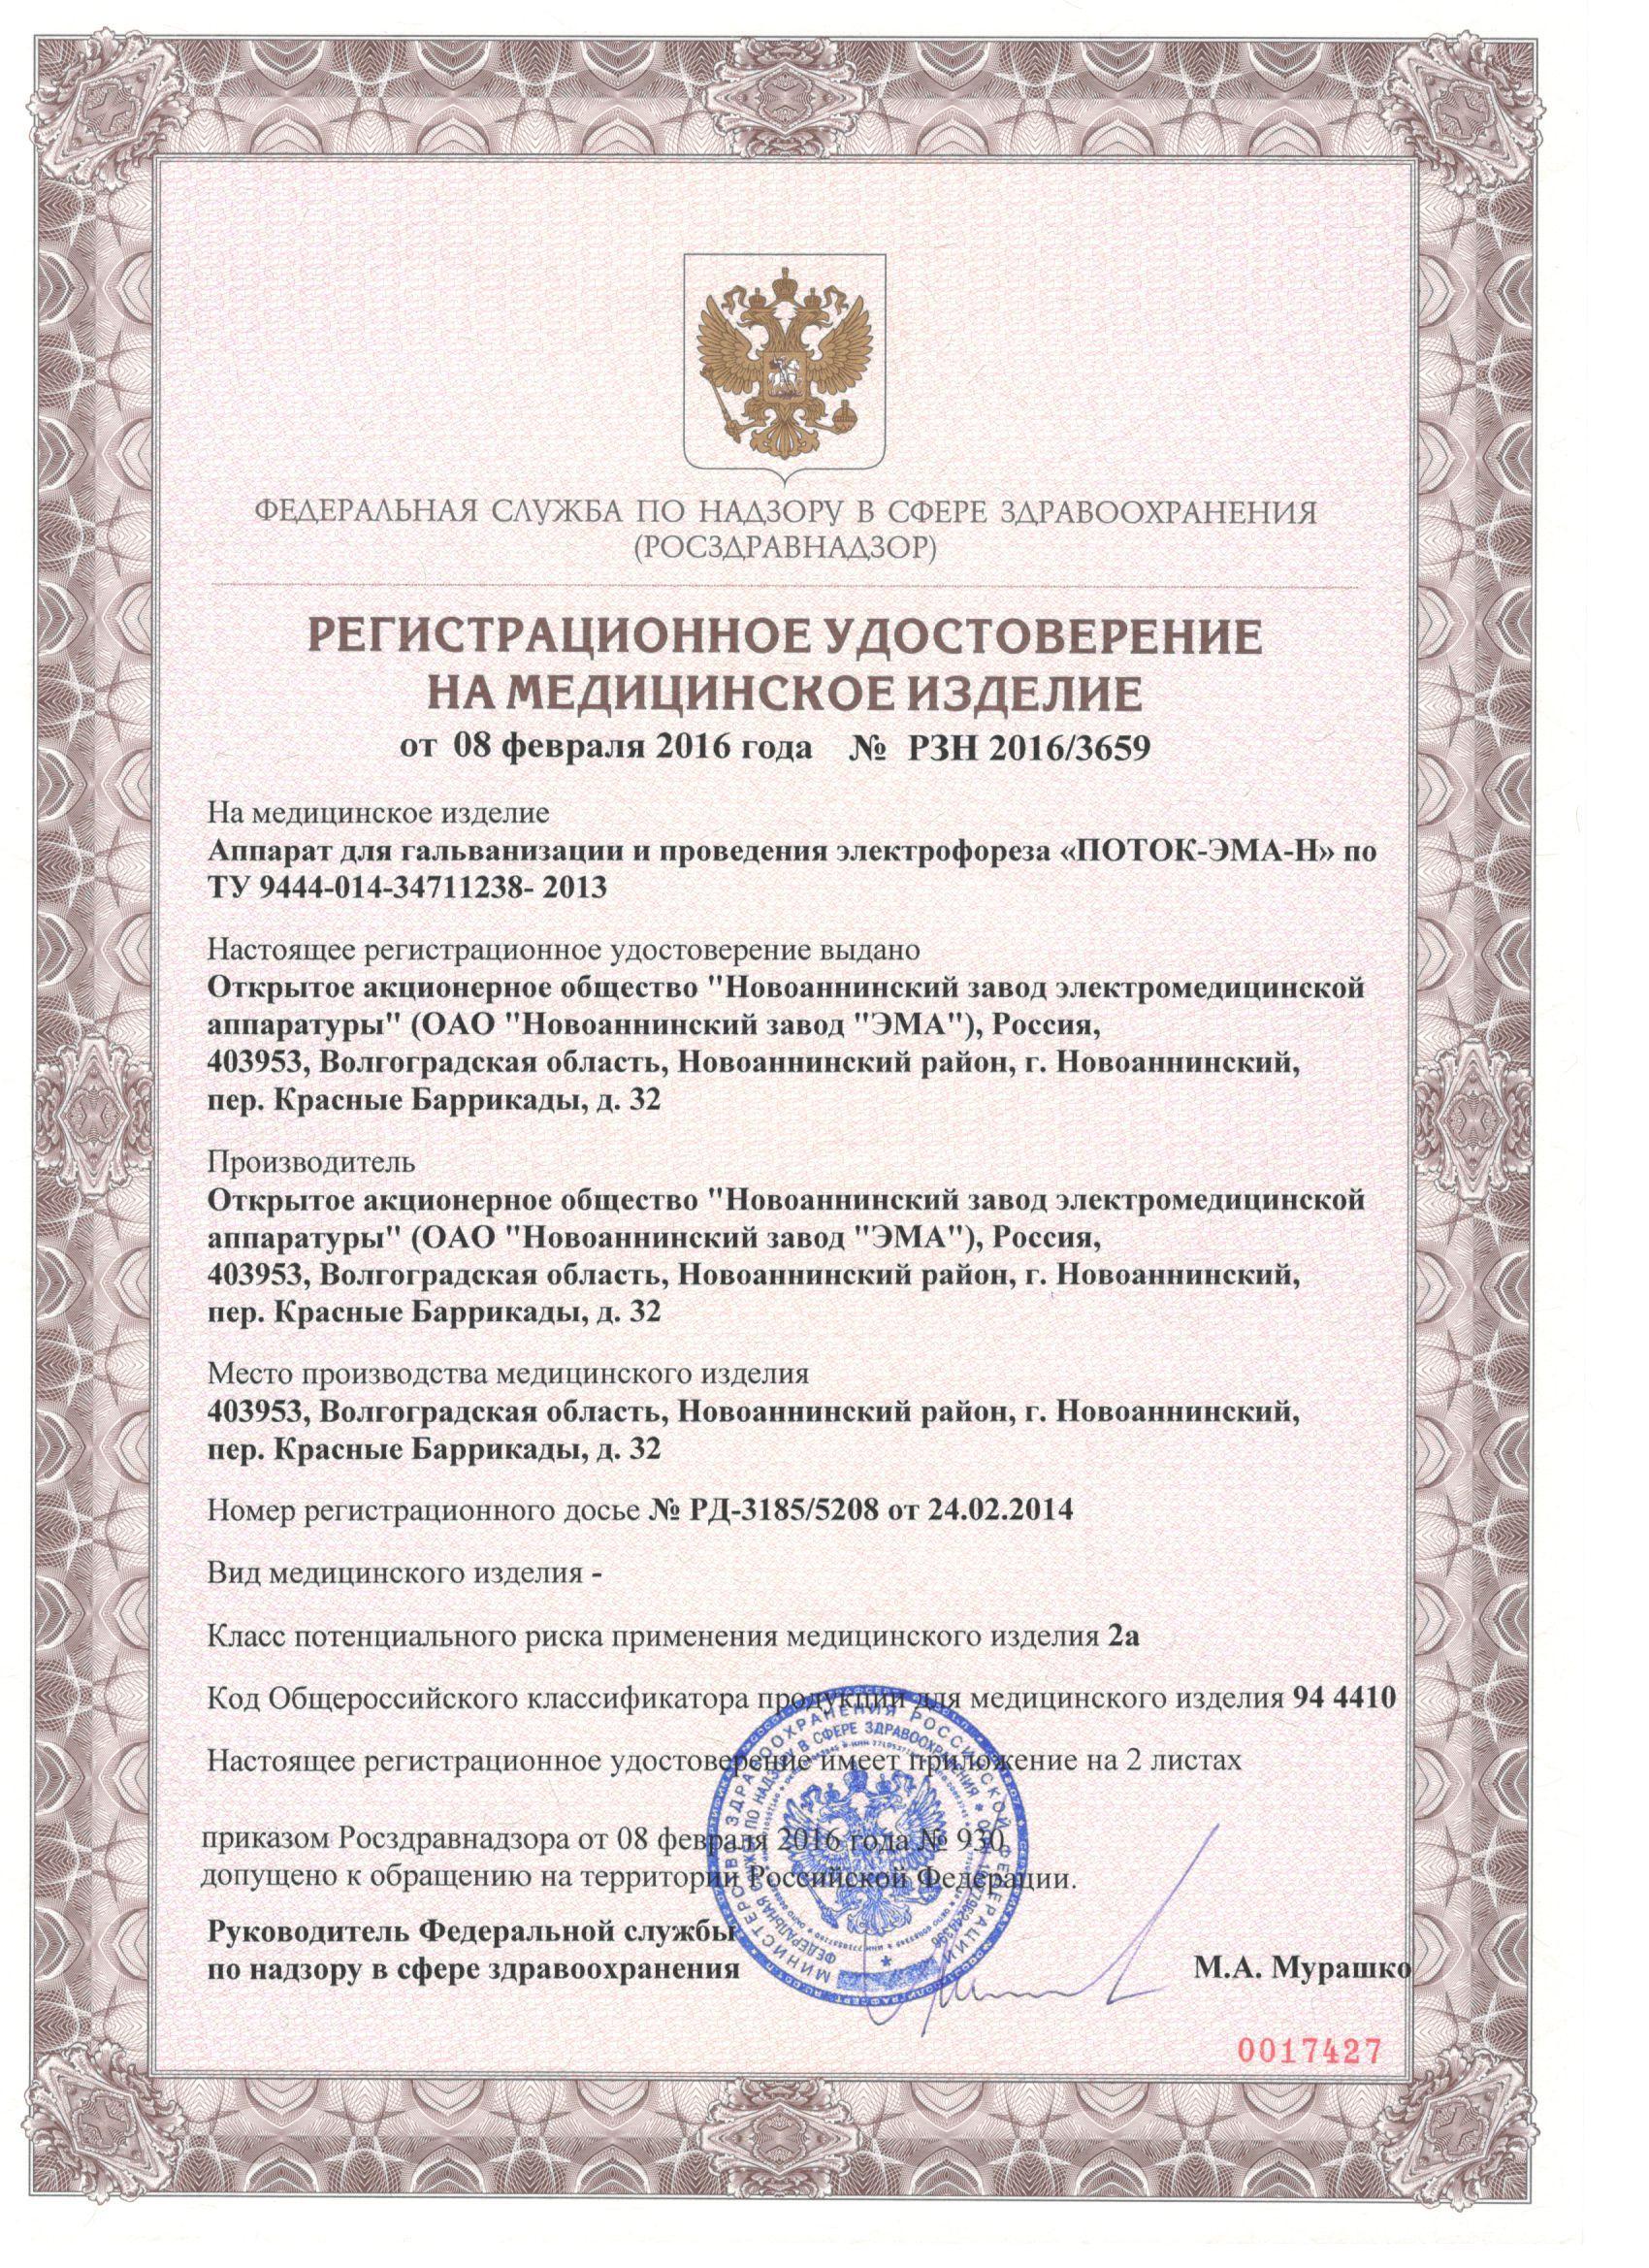 сертификат Поток-ЭМА-Н